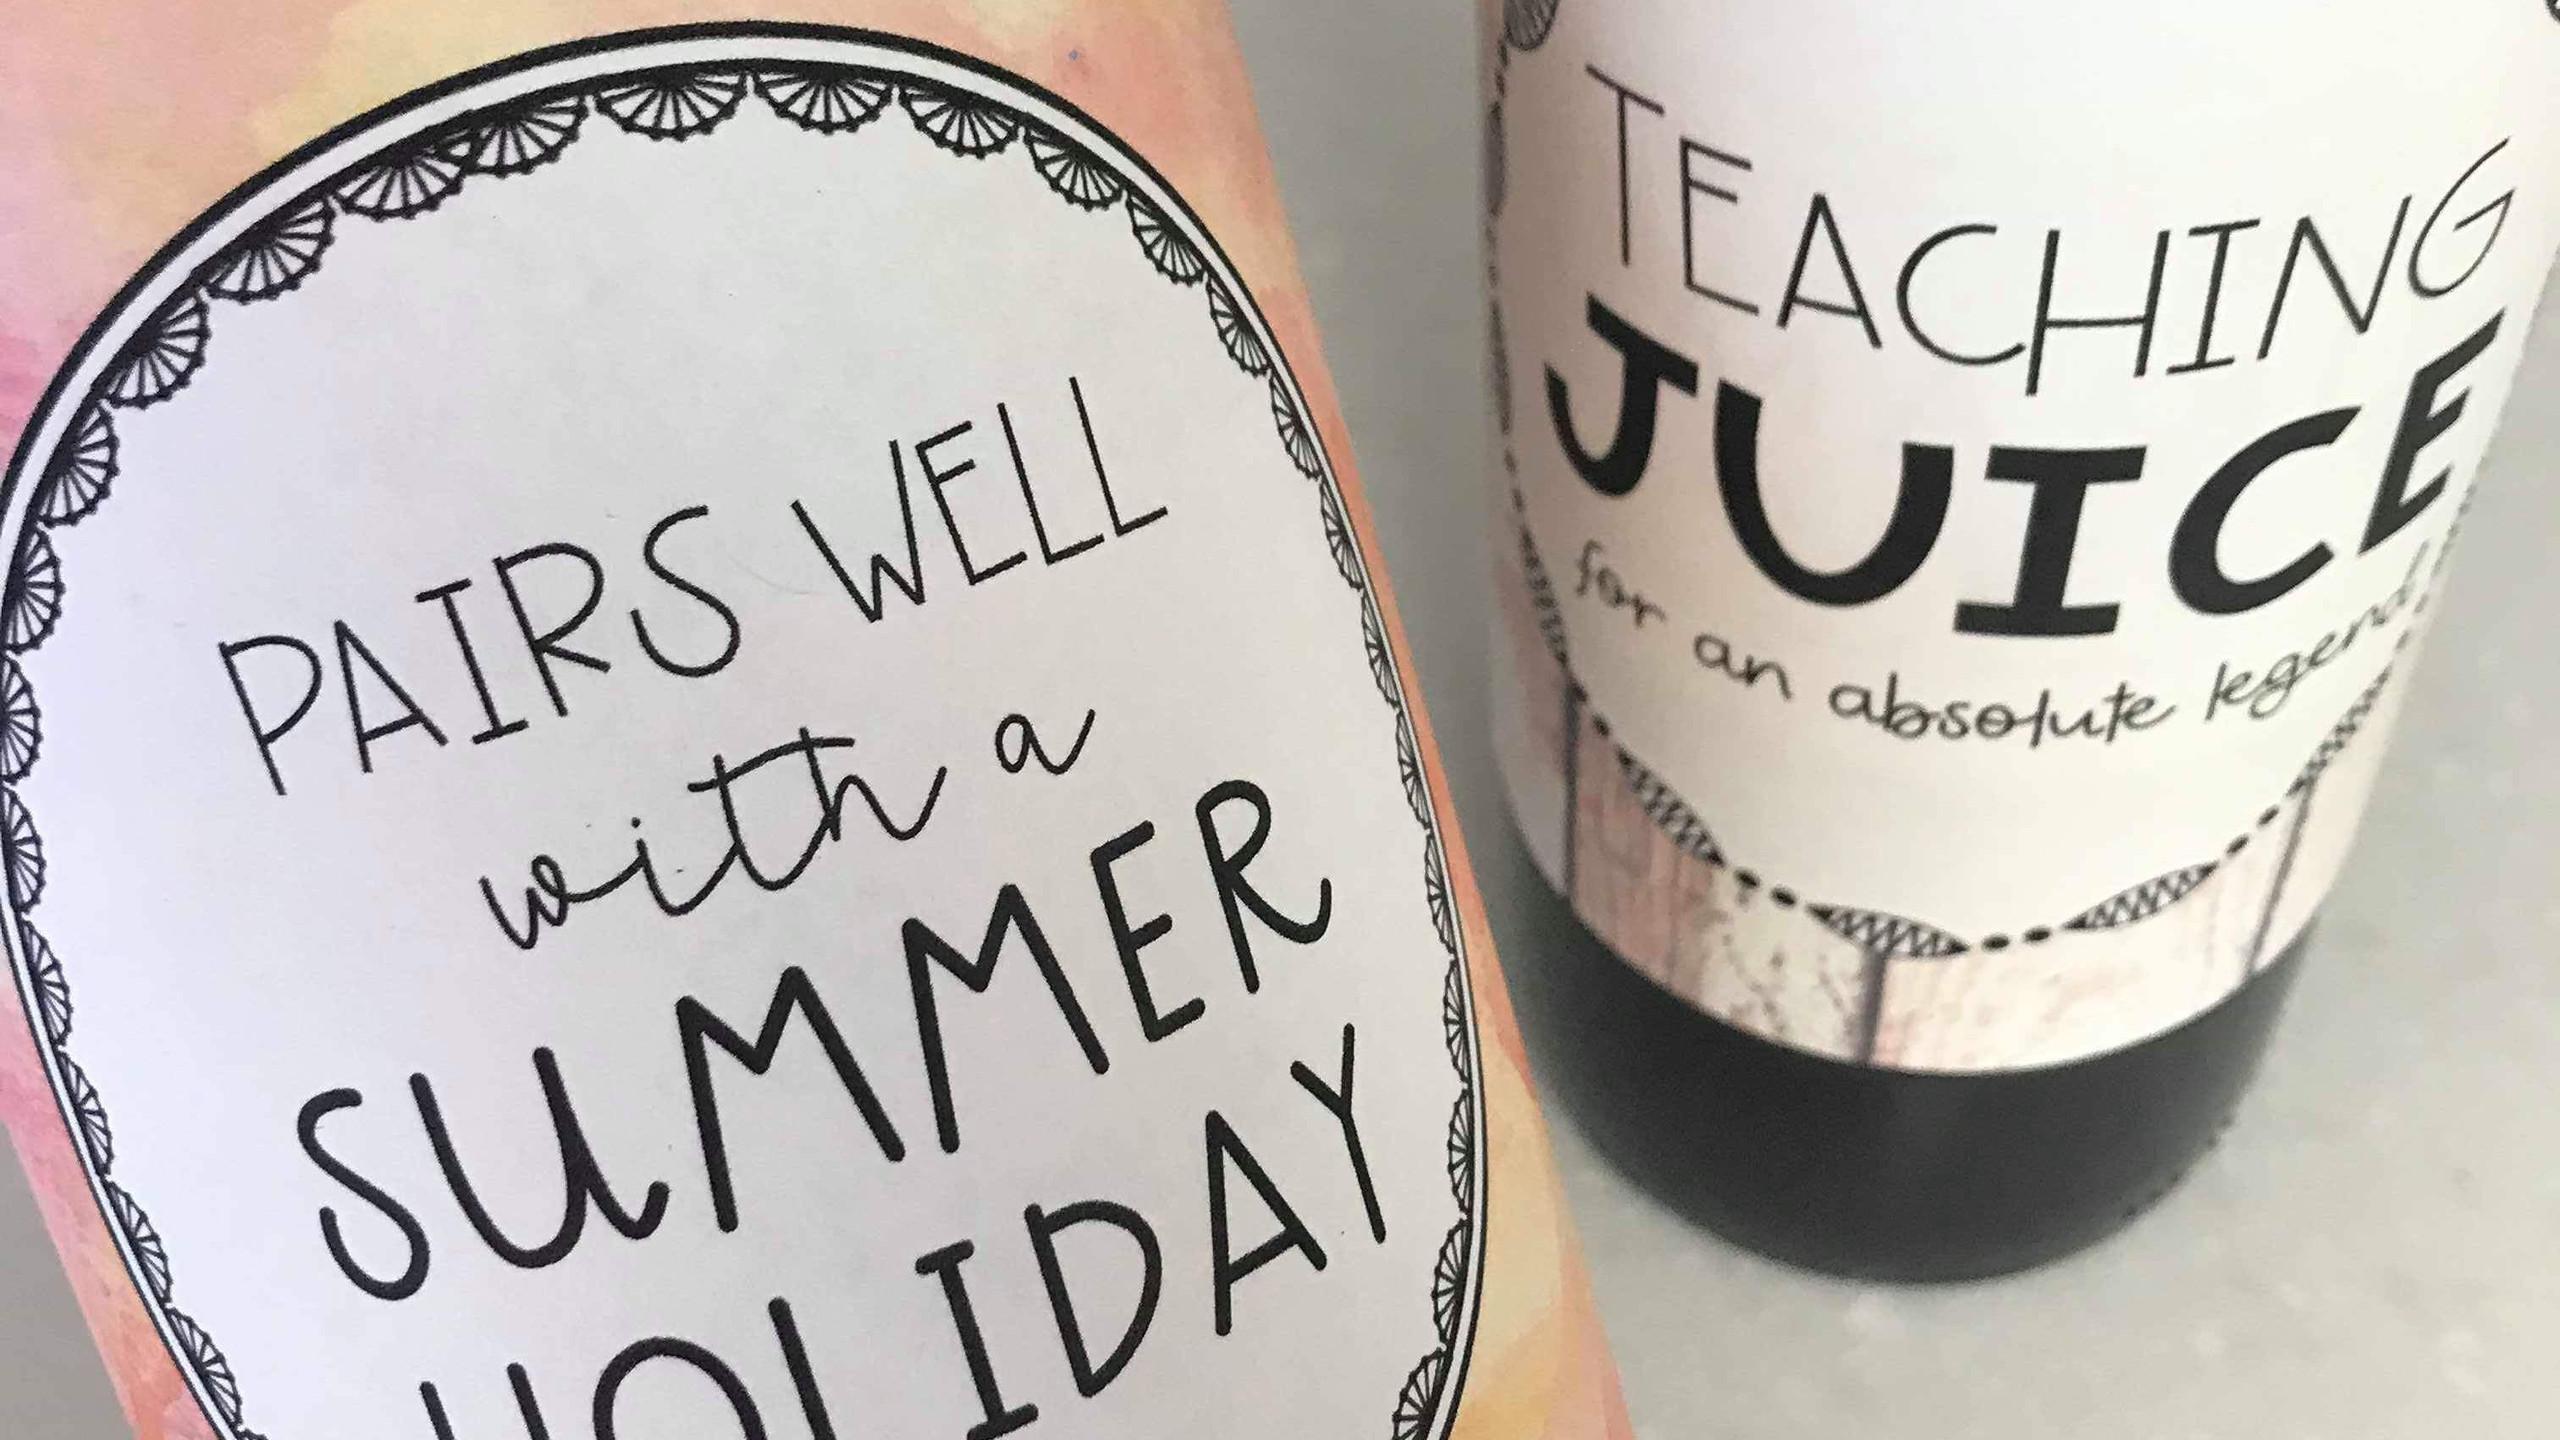 Teacher wine gift